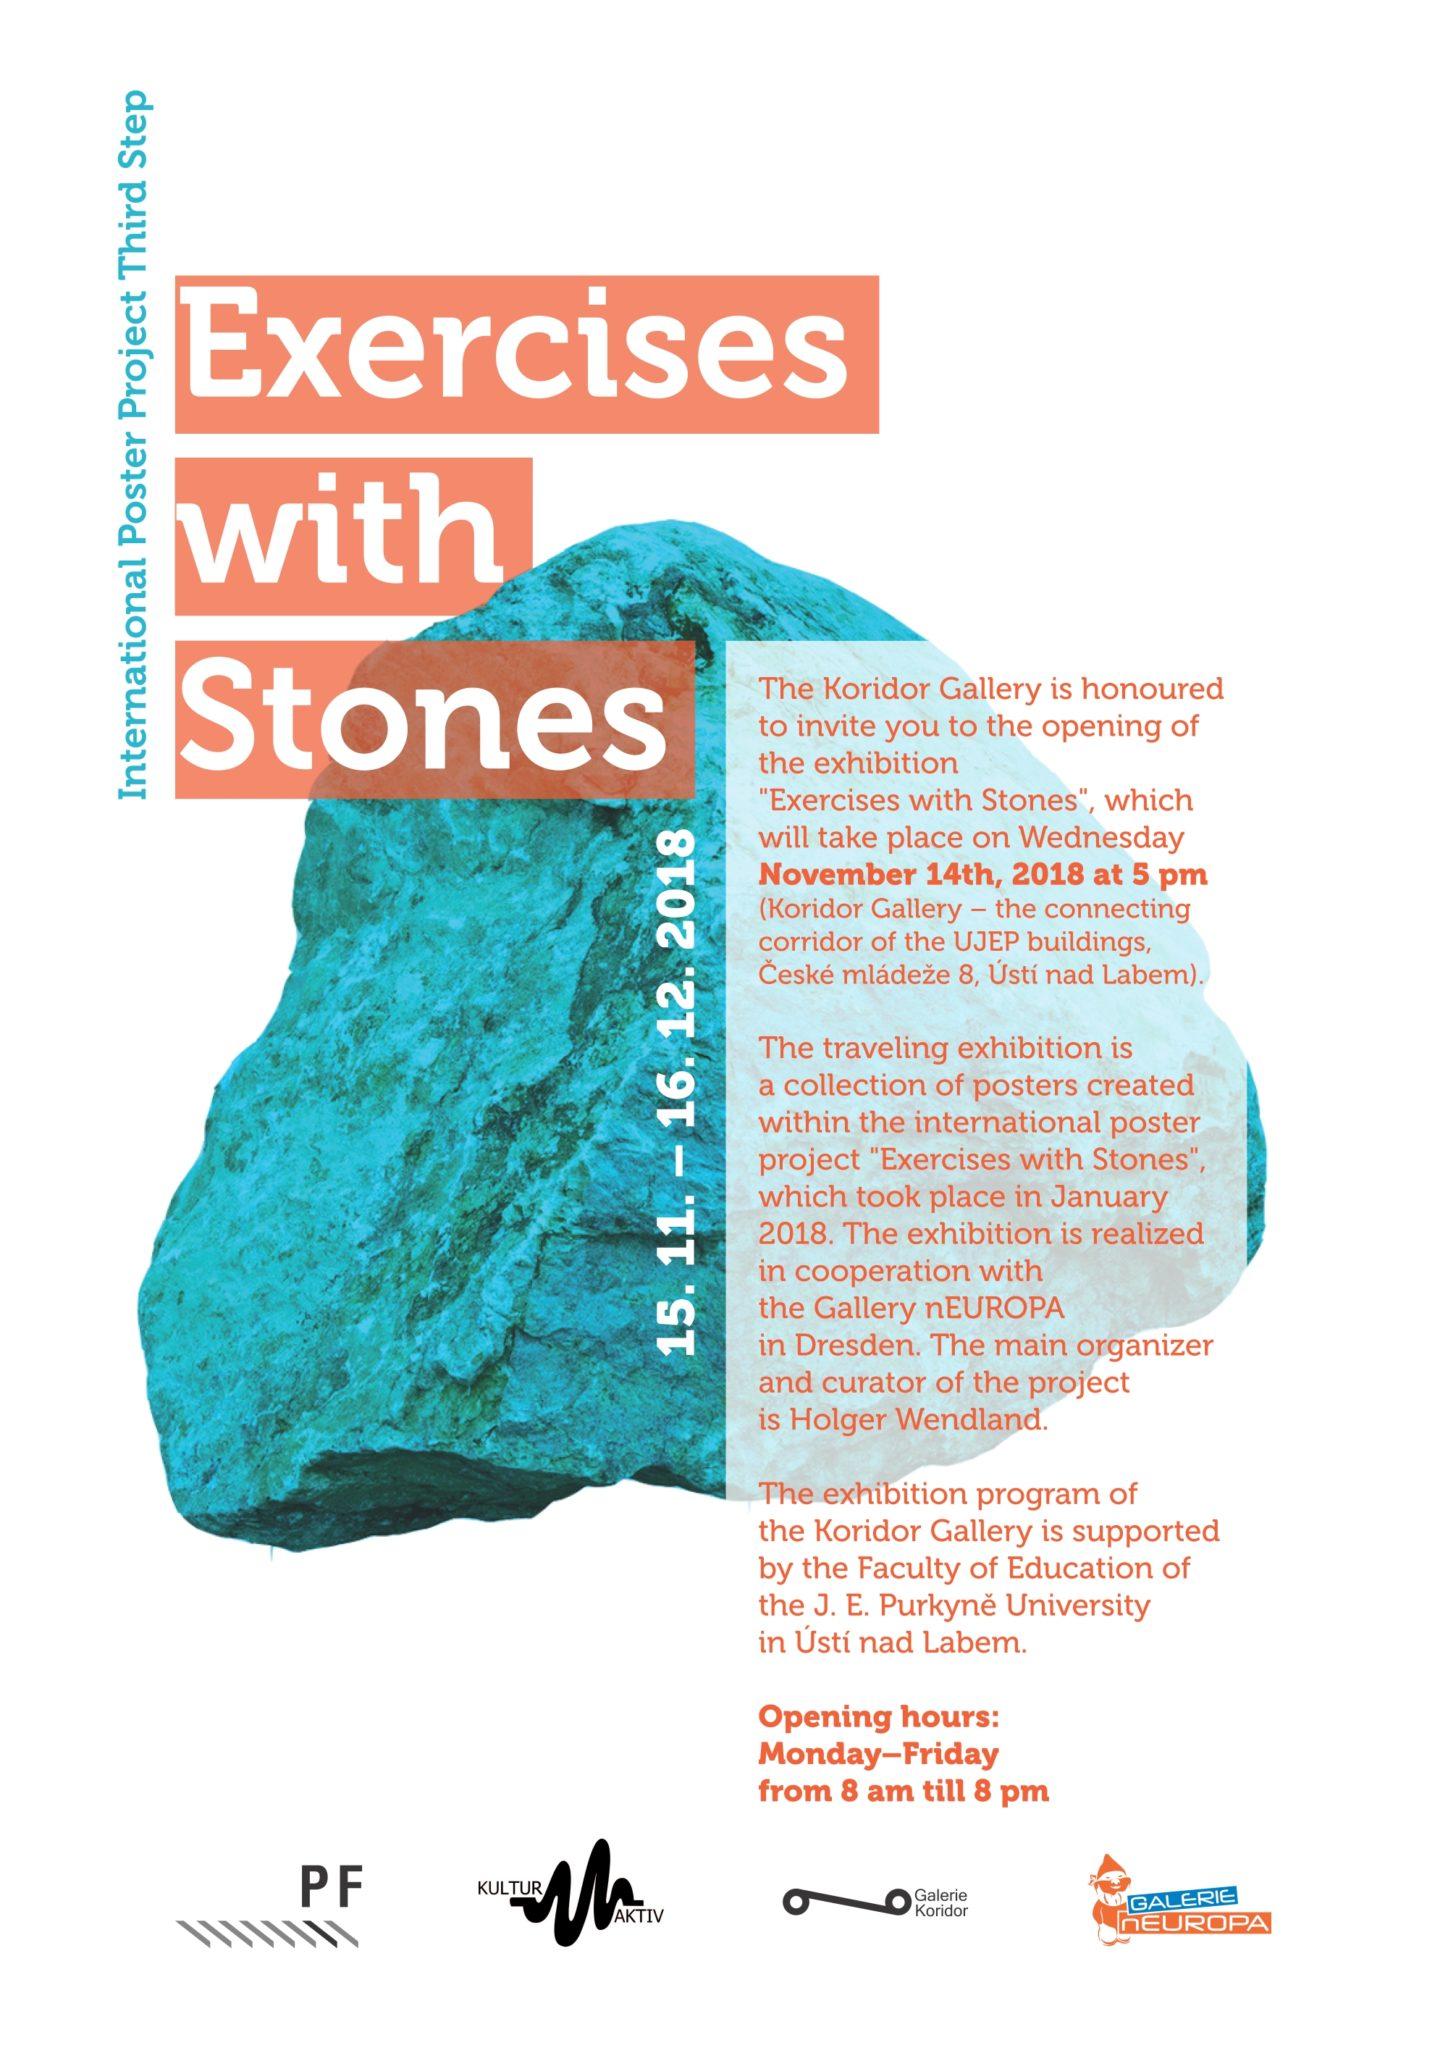 Exercises with Stones - Koridor Gallery